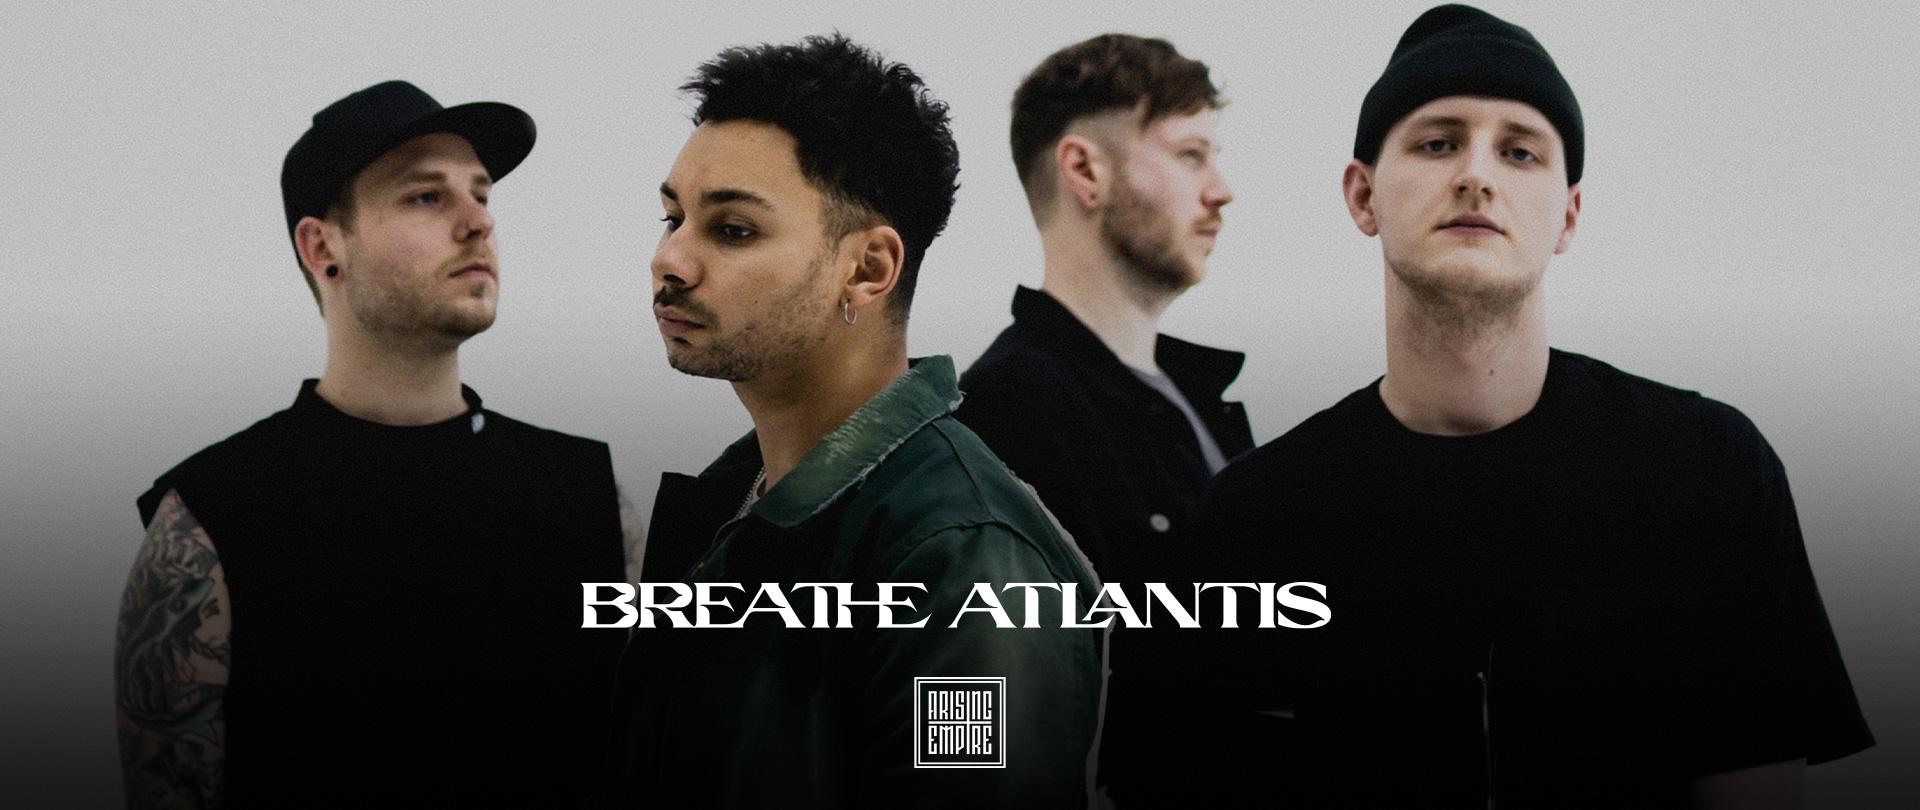 Breathe Atlantis at Arising Empire • Official Online Shop / EN